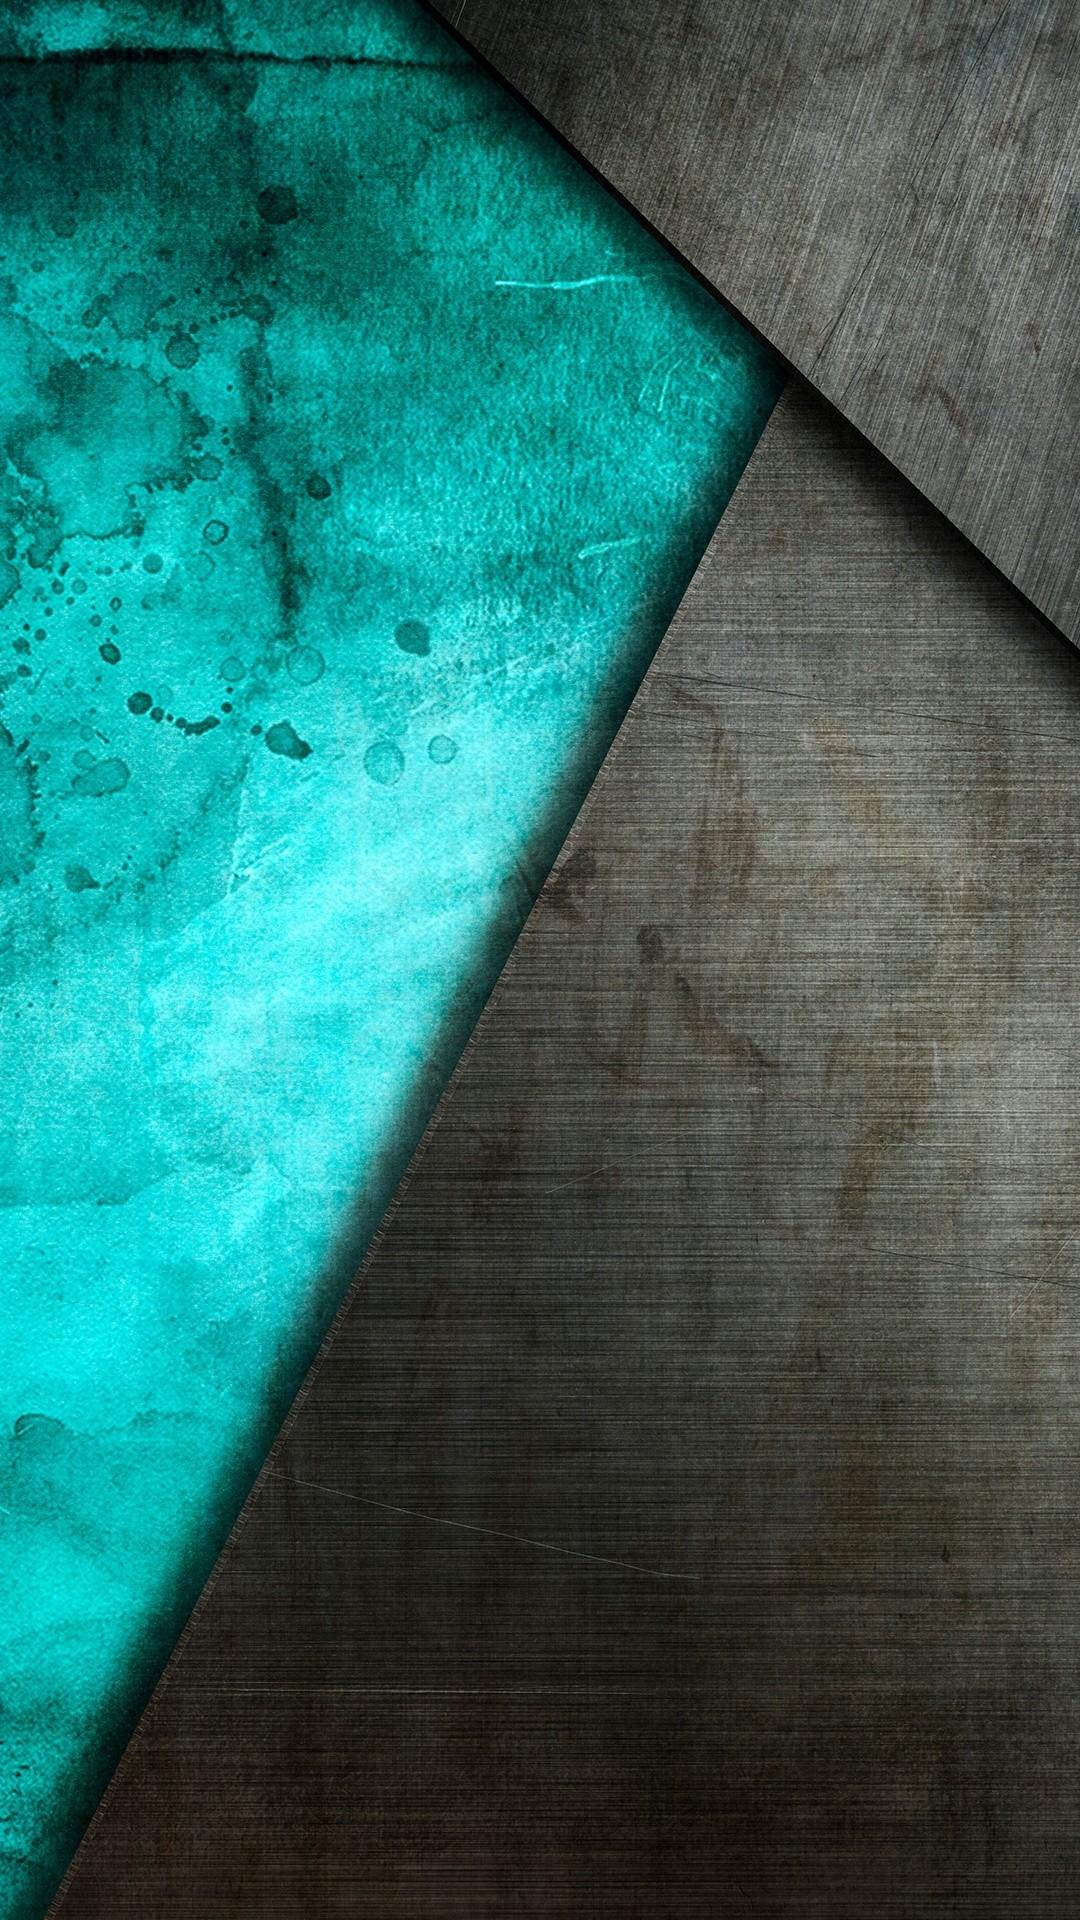 Grunge iPhone hd wallpaper